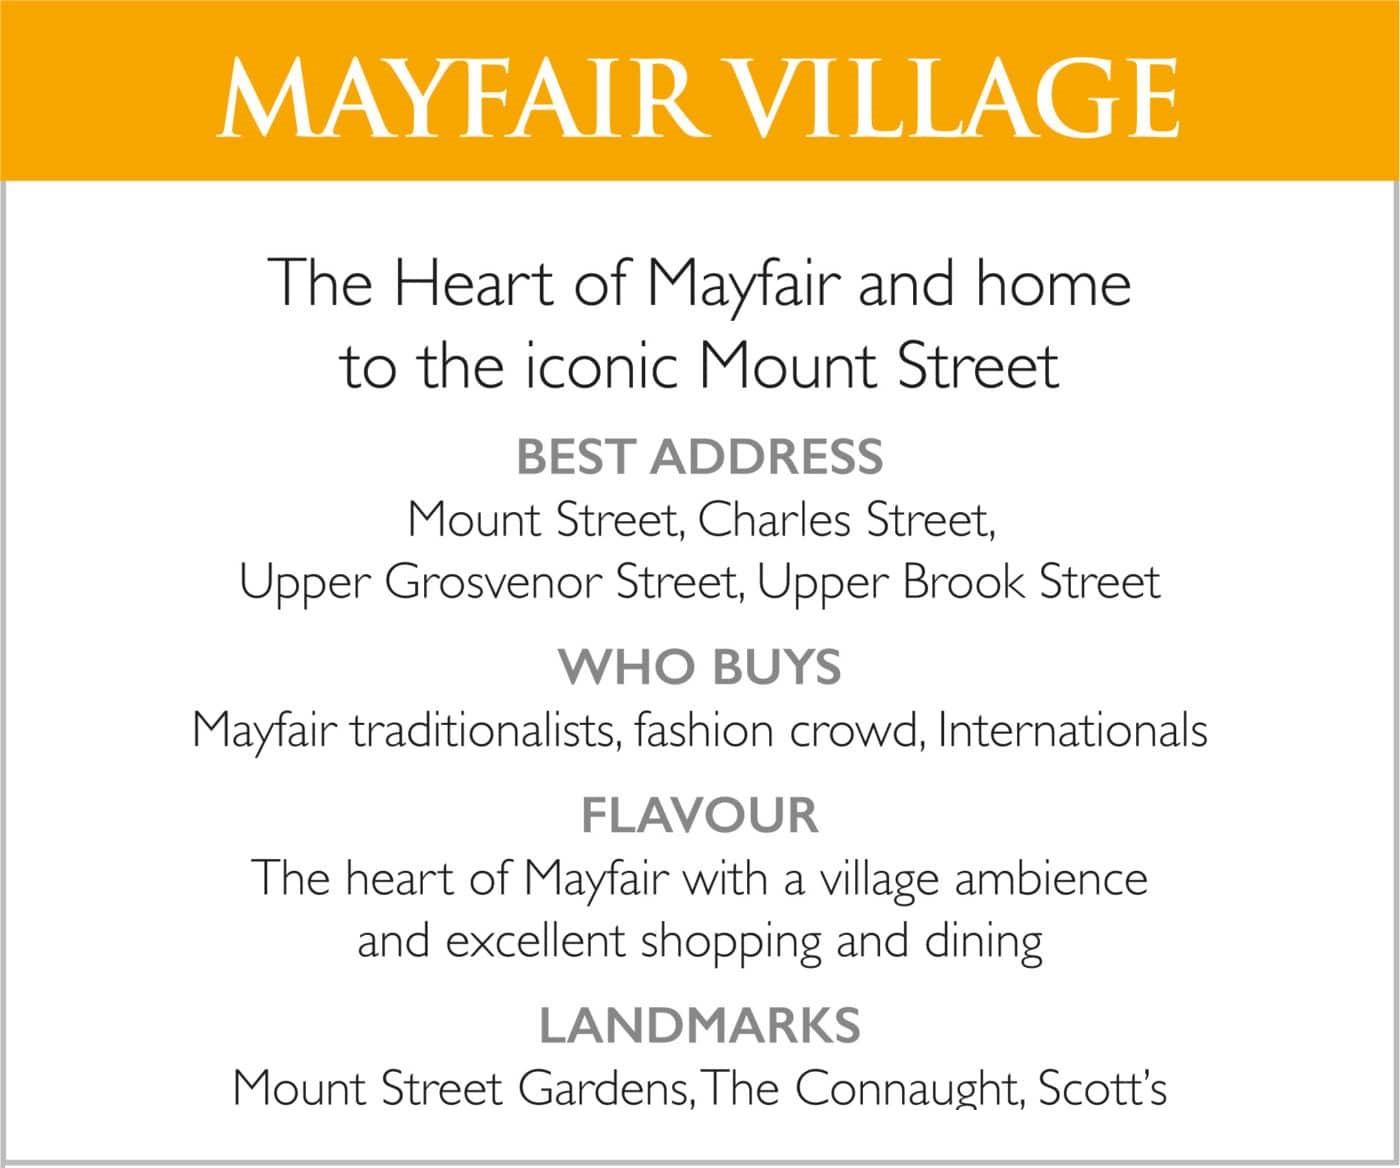 Mayfair Village List of Features